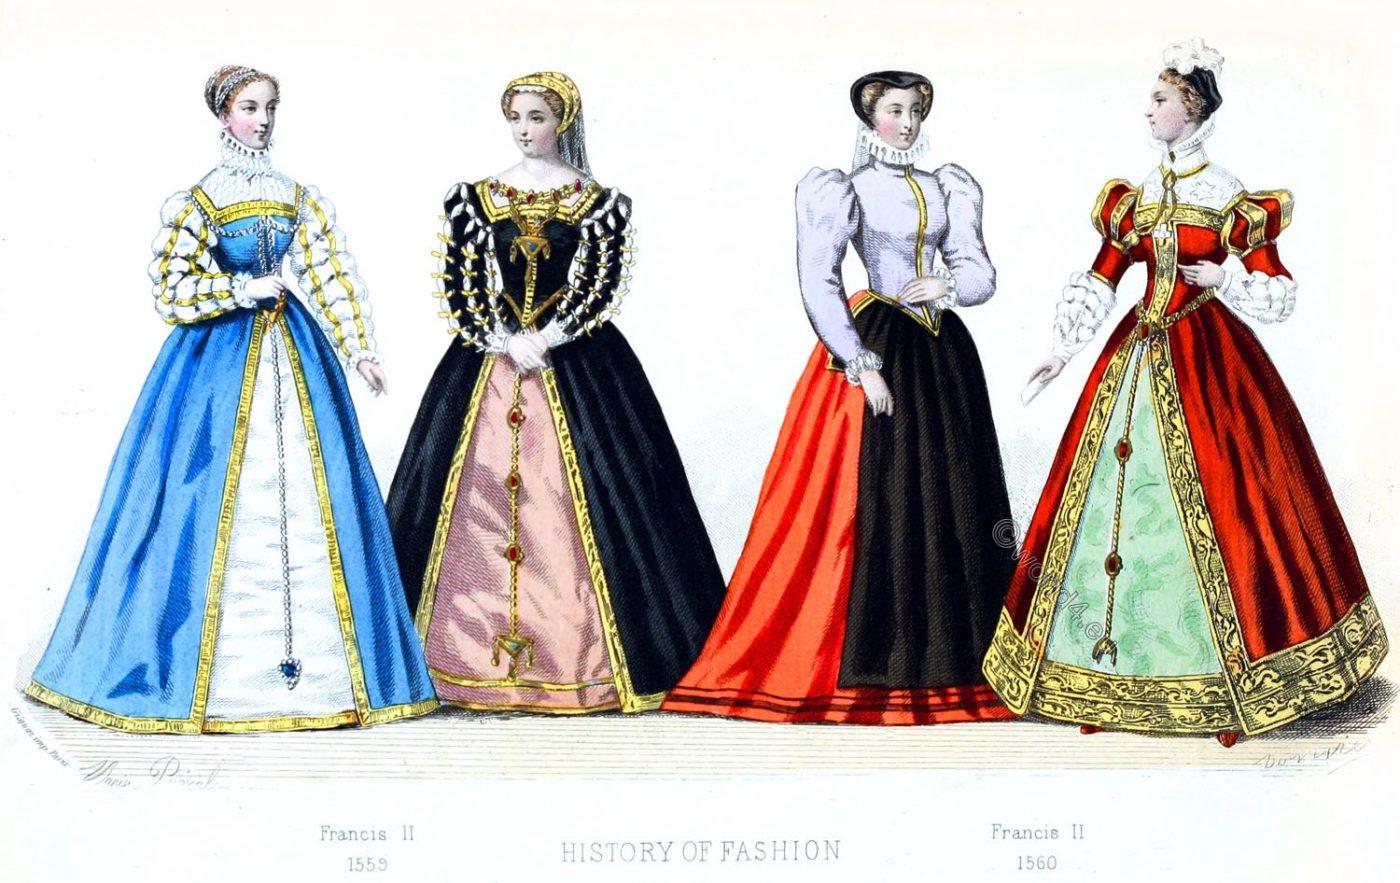 Fashion, history, Renaissance, Spanish, court dress, Francis II